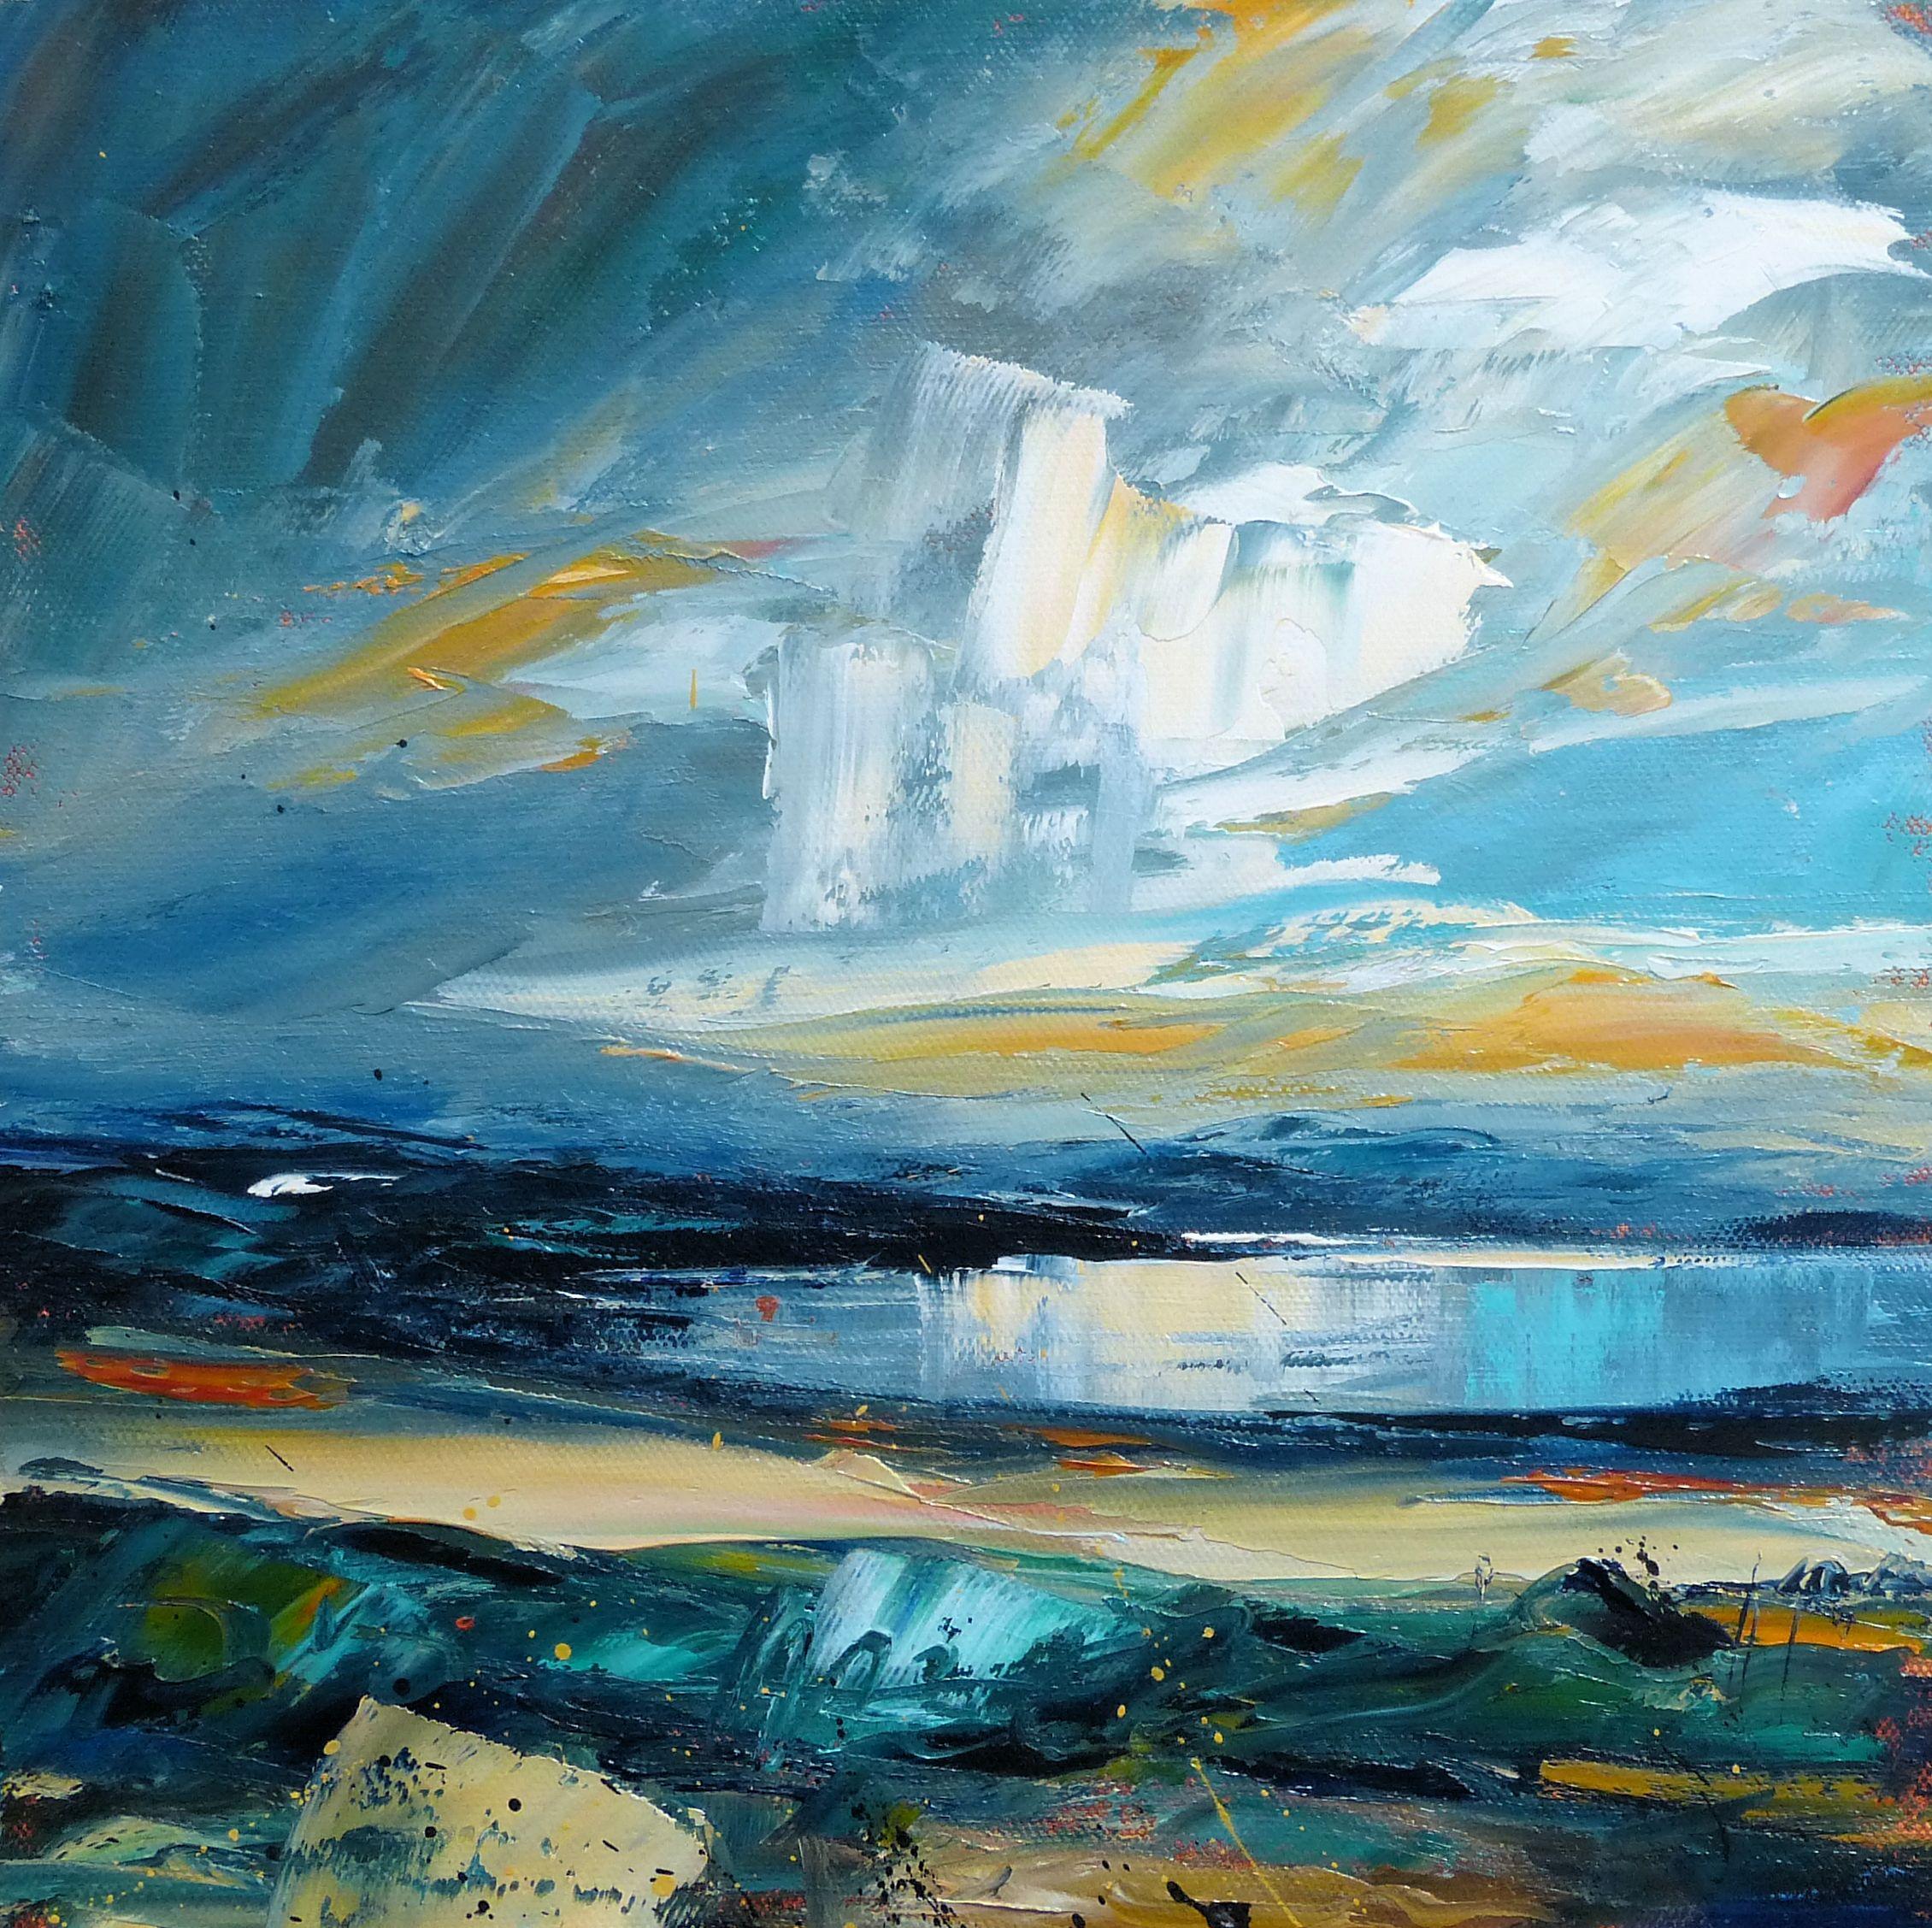 Evening sky over Sutherland